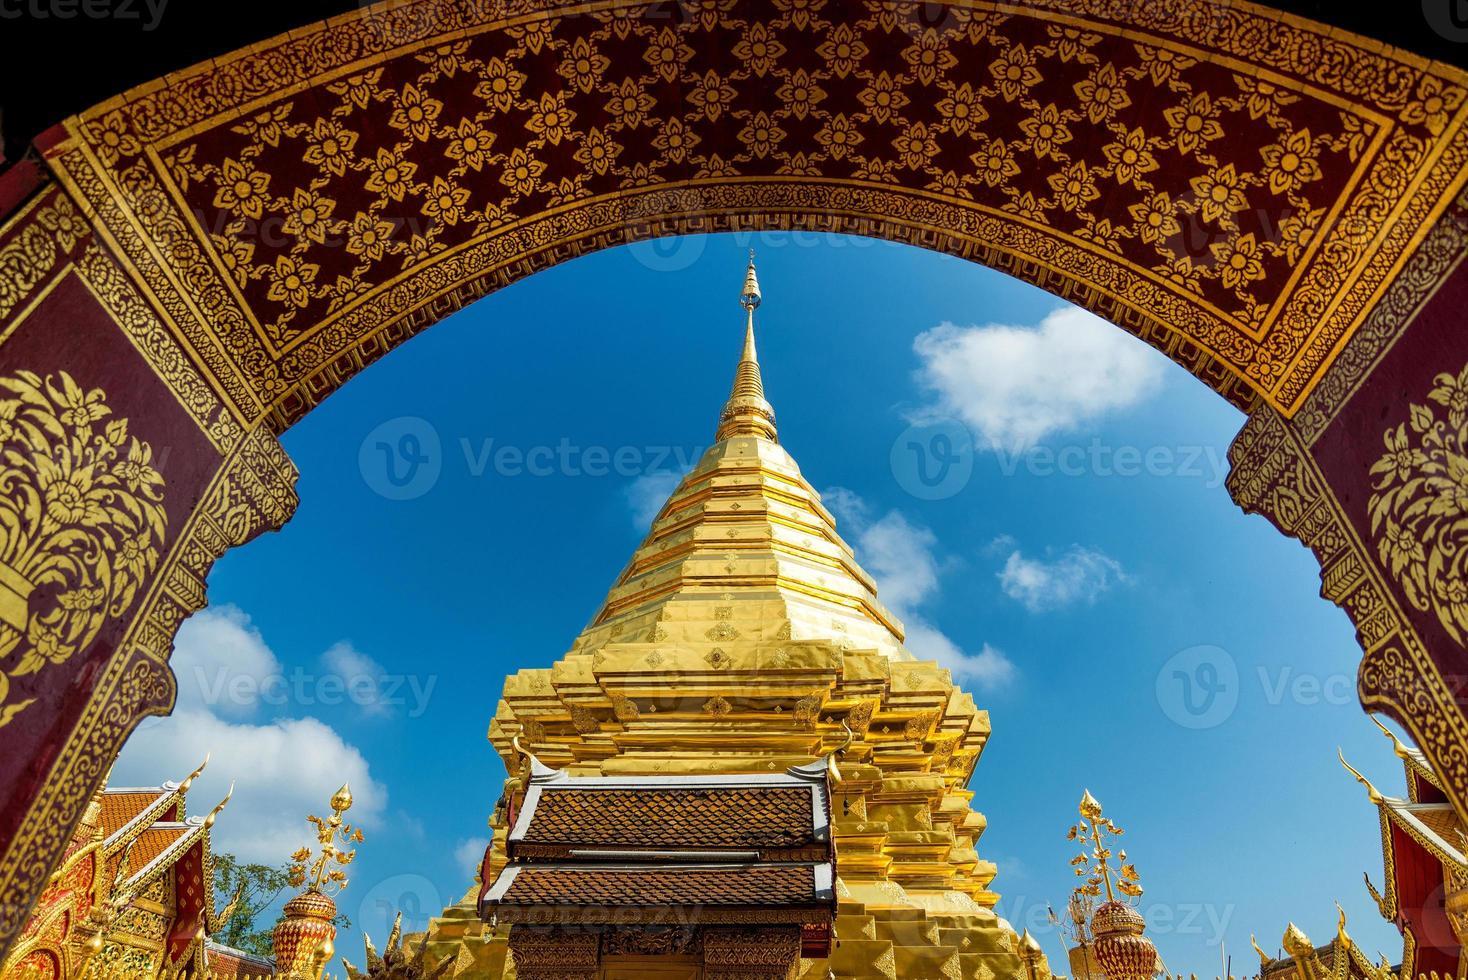 Wat Phra That Doi Suthep temple in Chiang Mai, Thailand photo